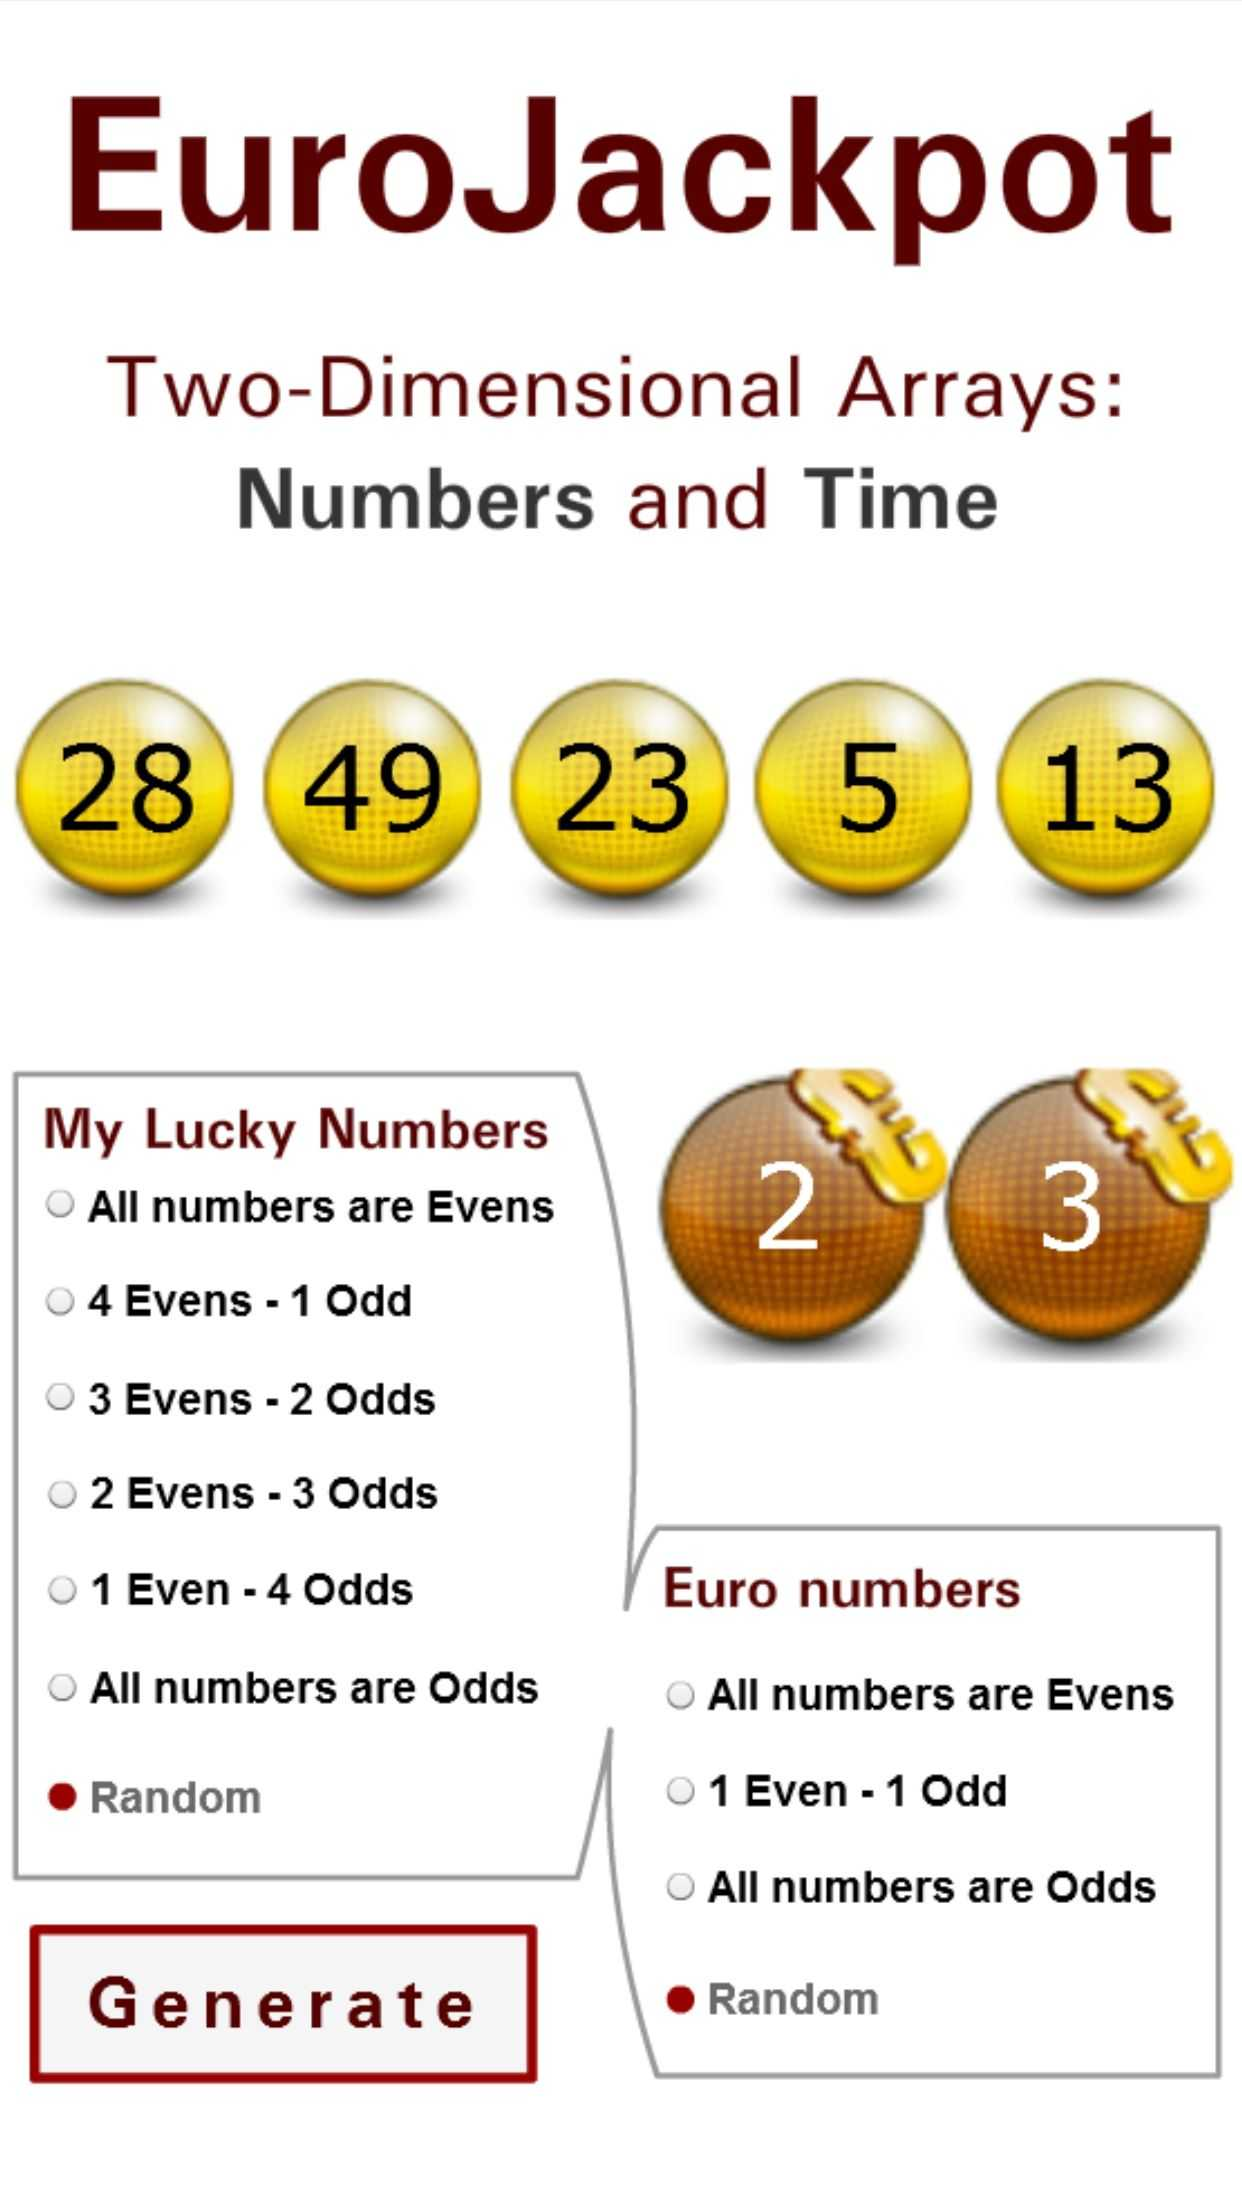 Eurojackpot Draw Ergebnisse